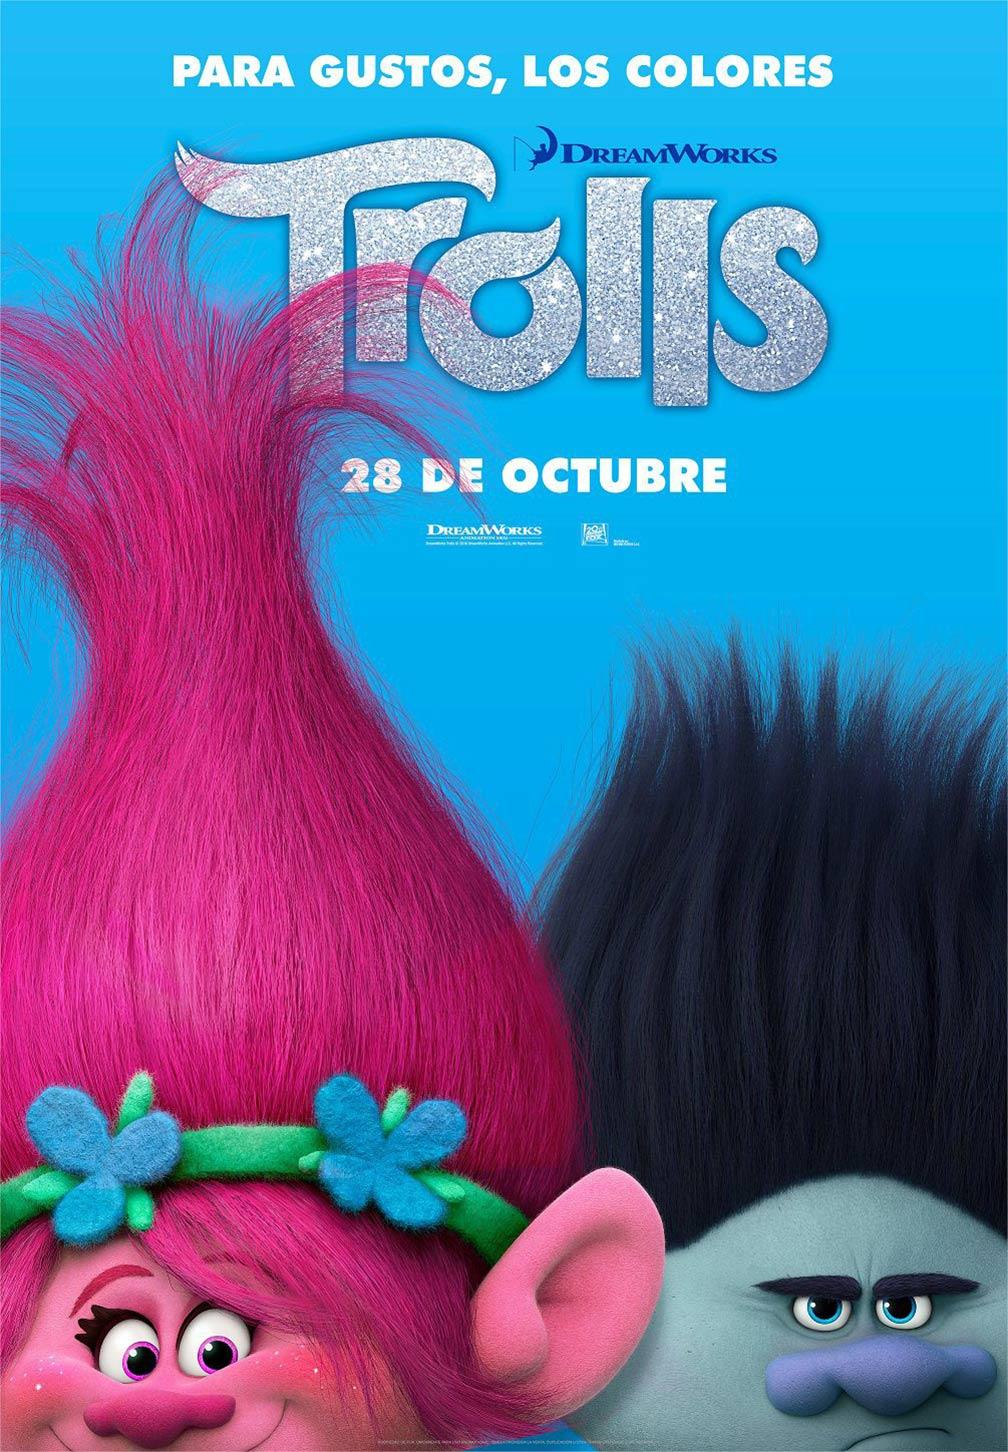 Trolls 2016 Poster 1 Trailer Addict